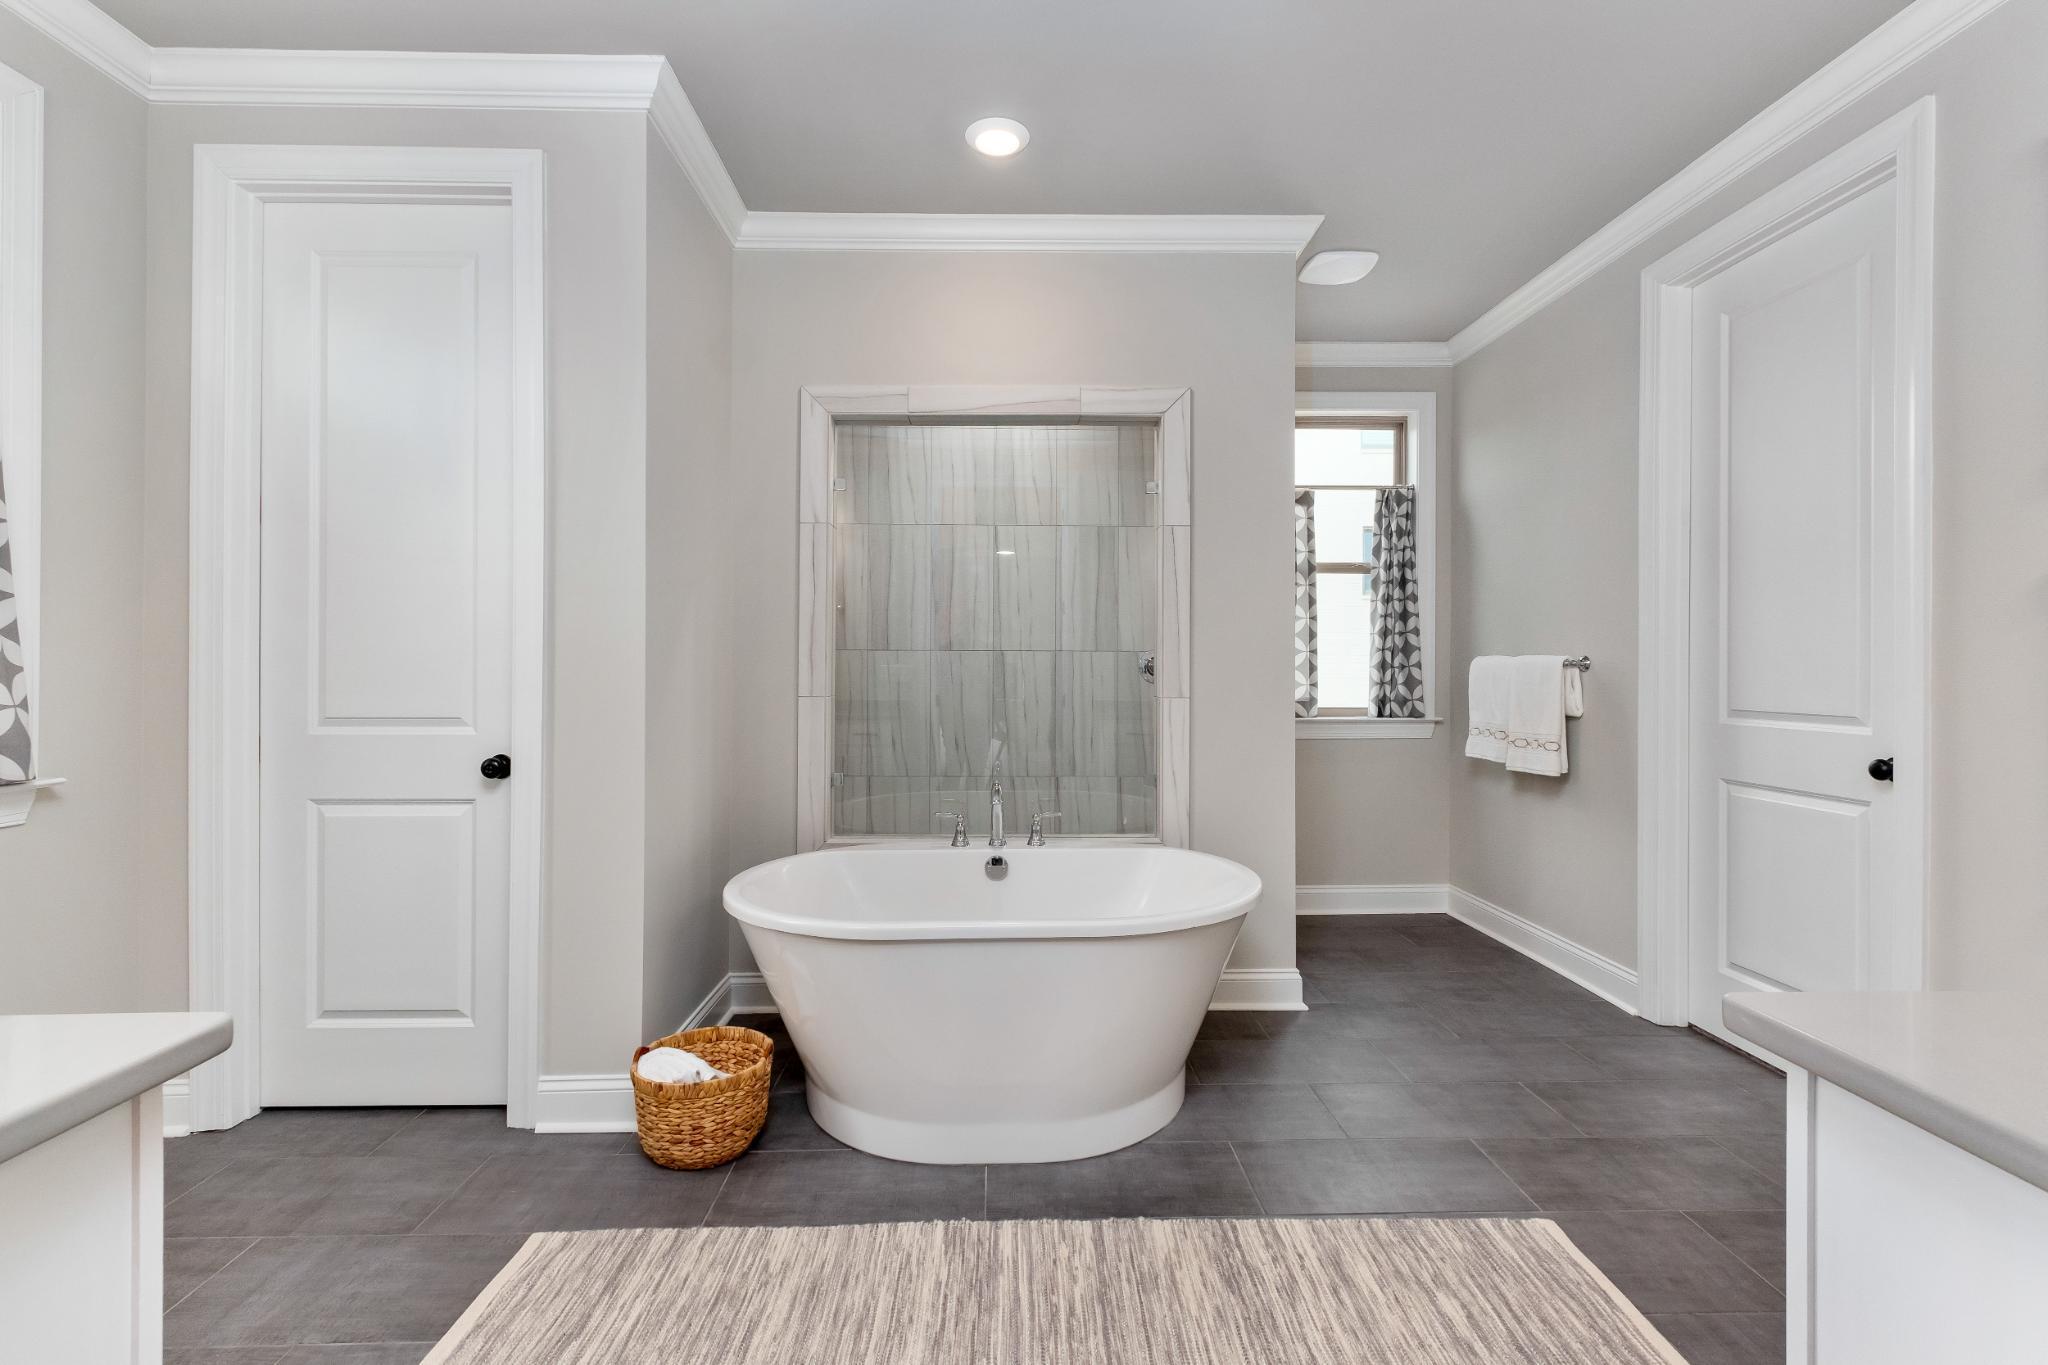 Bathroom featured in the Rosemont By Harris Doyle Homes Inc in Birmingham, AL